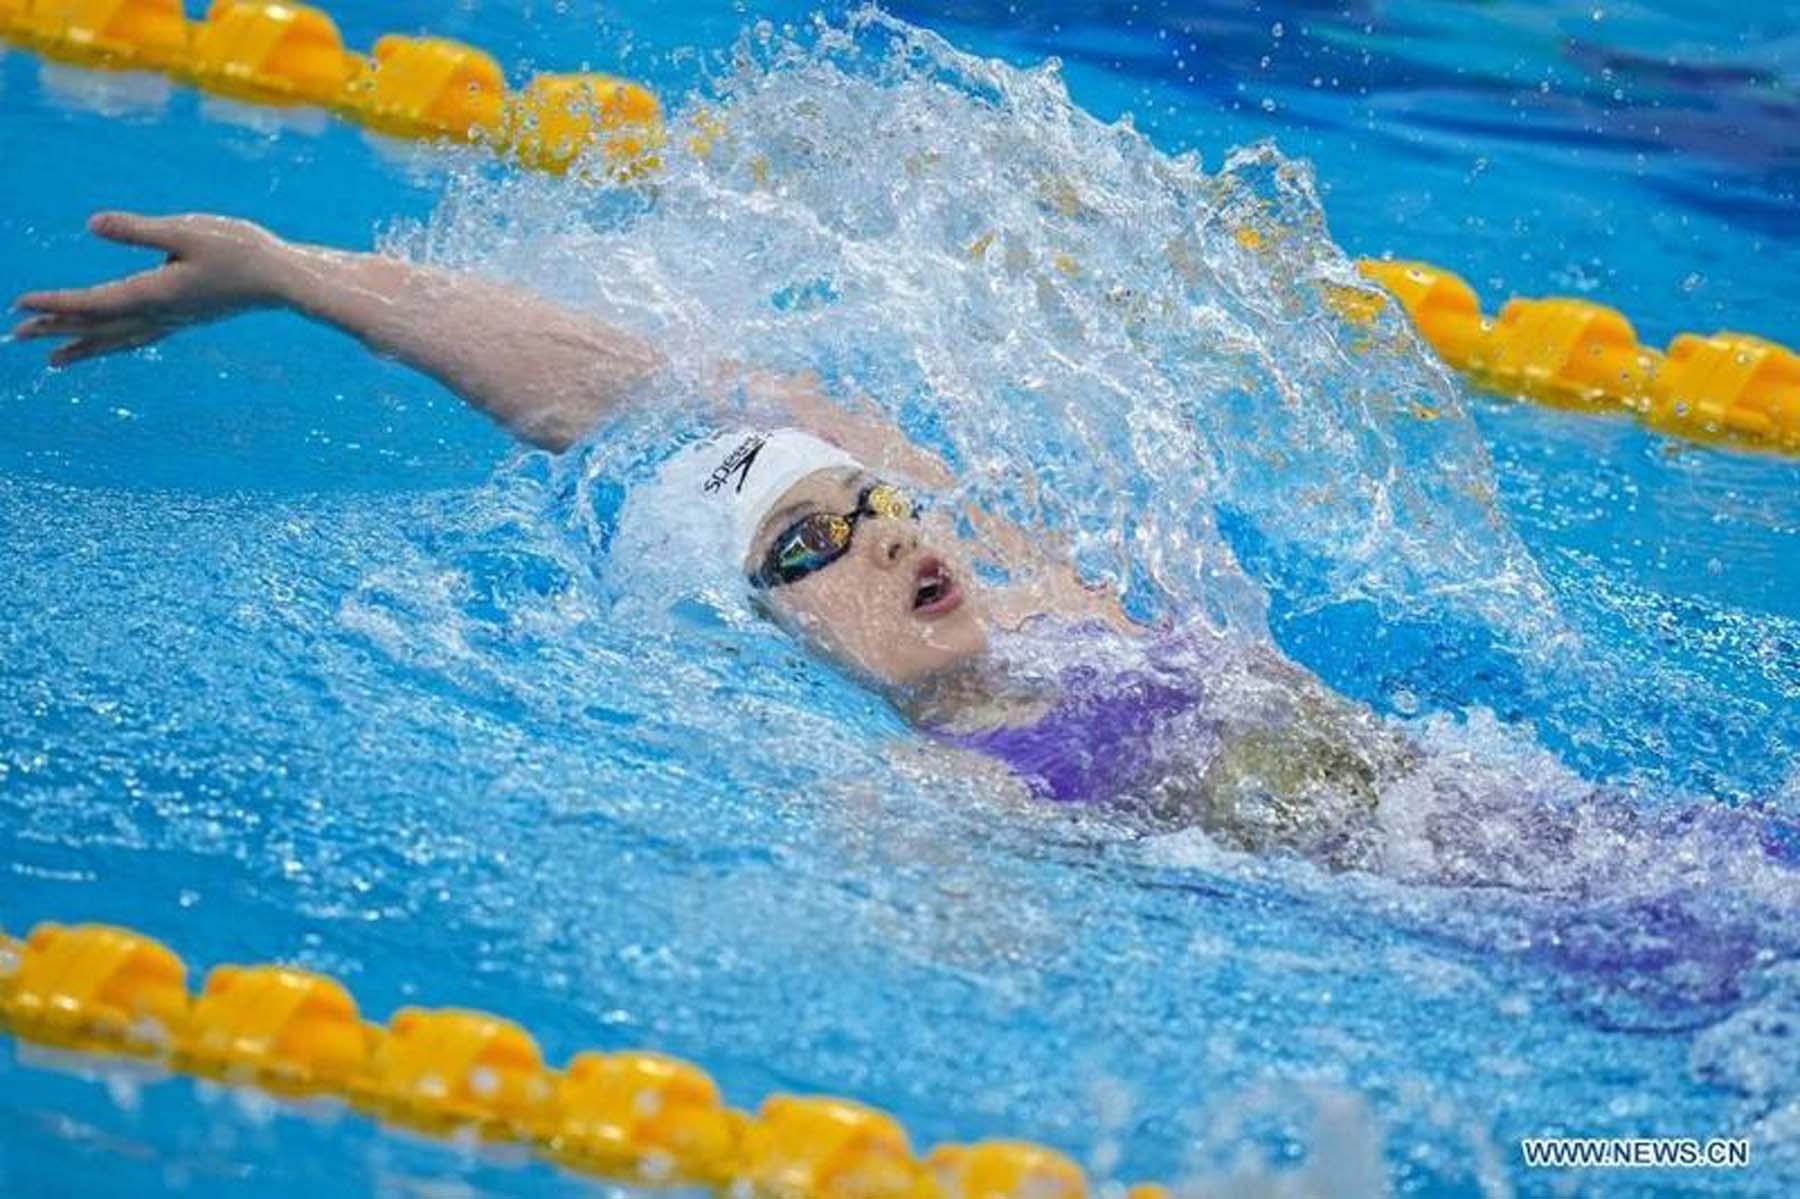 Youth swimmer Yu Yiting breaks world junior record twice in 2 days